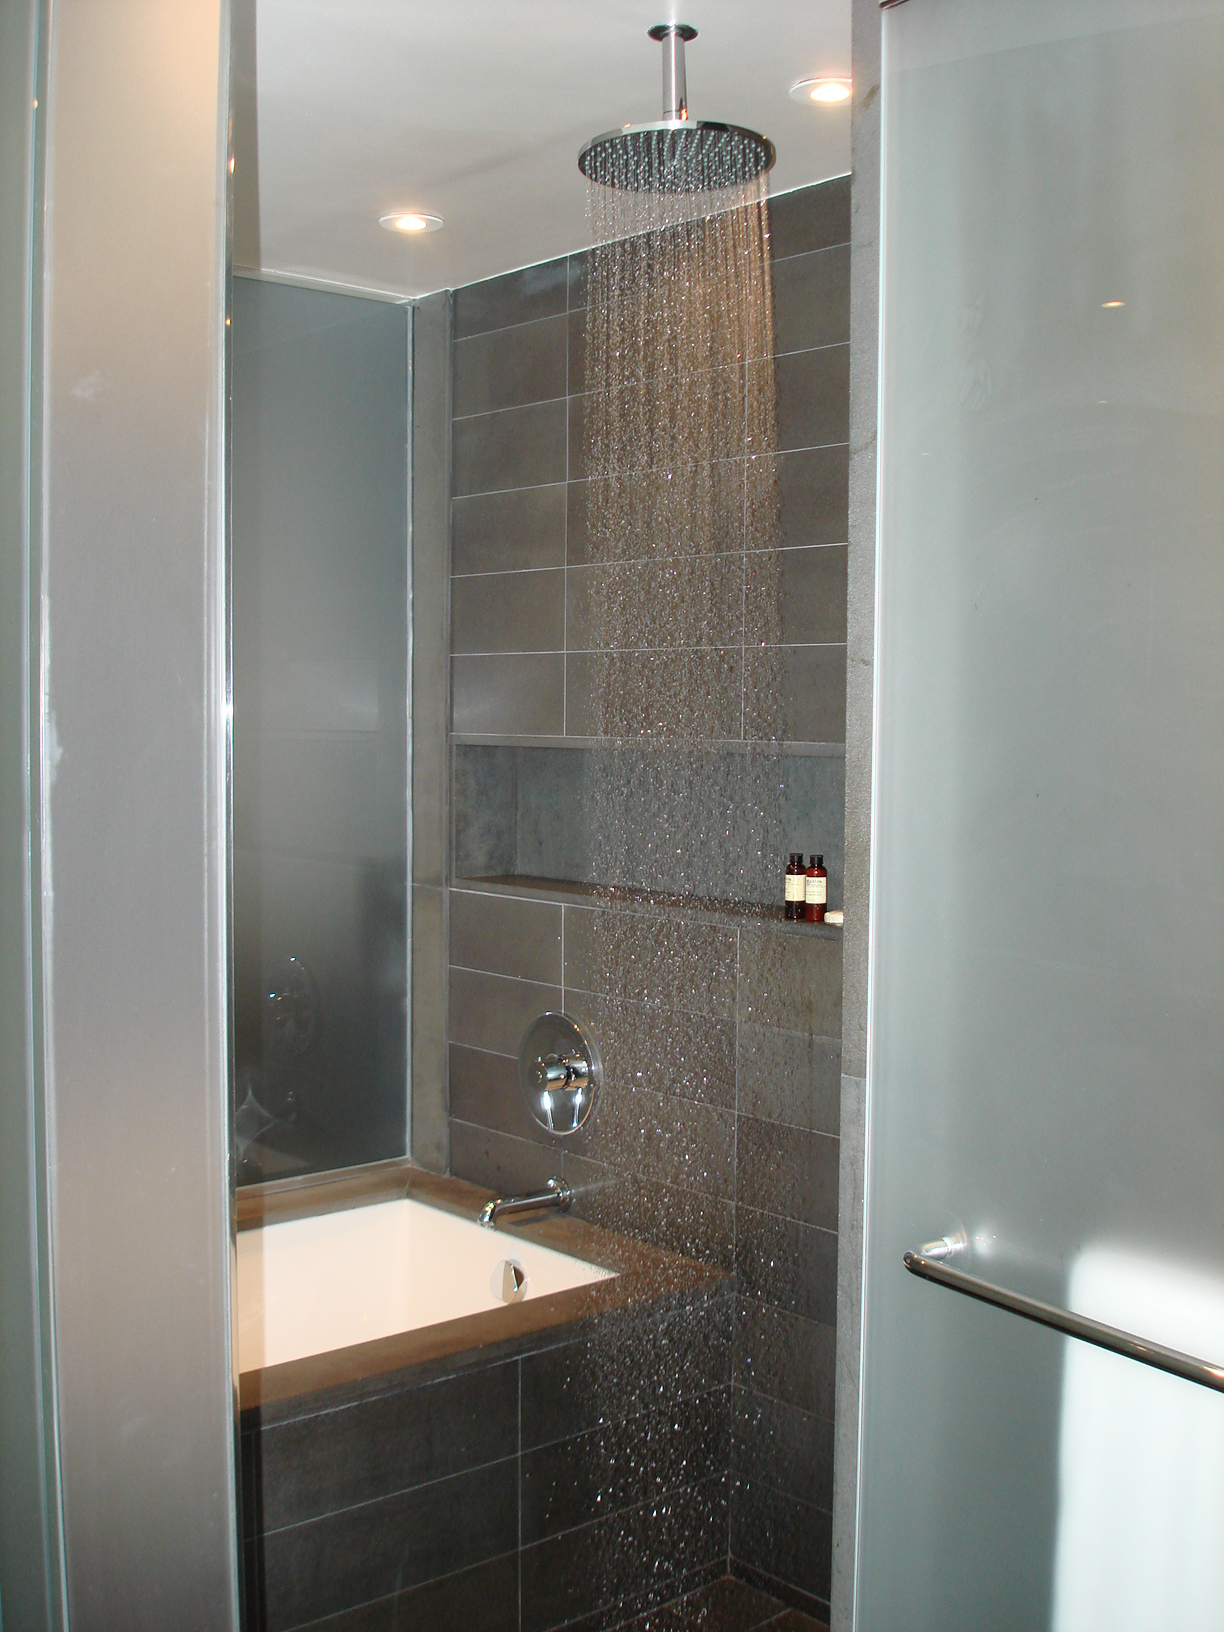 Waterfall Shower and bath tub